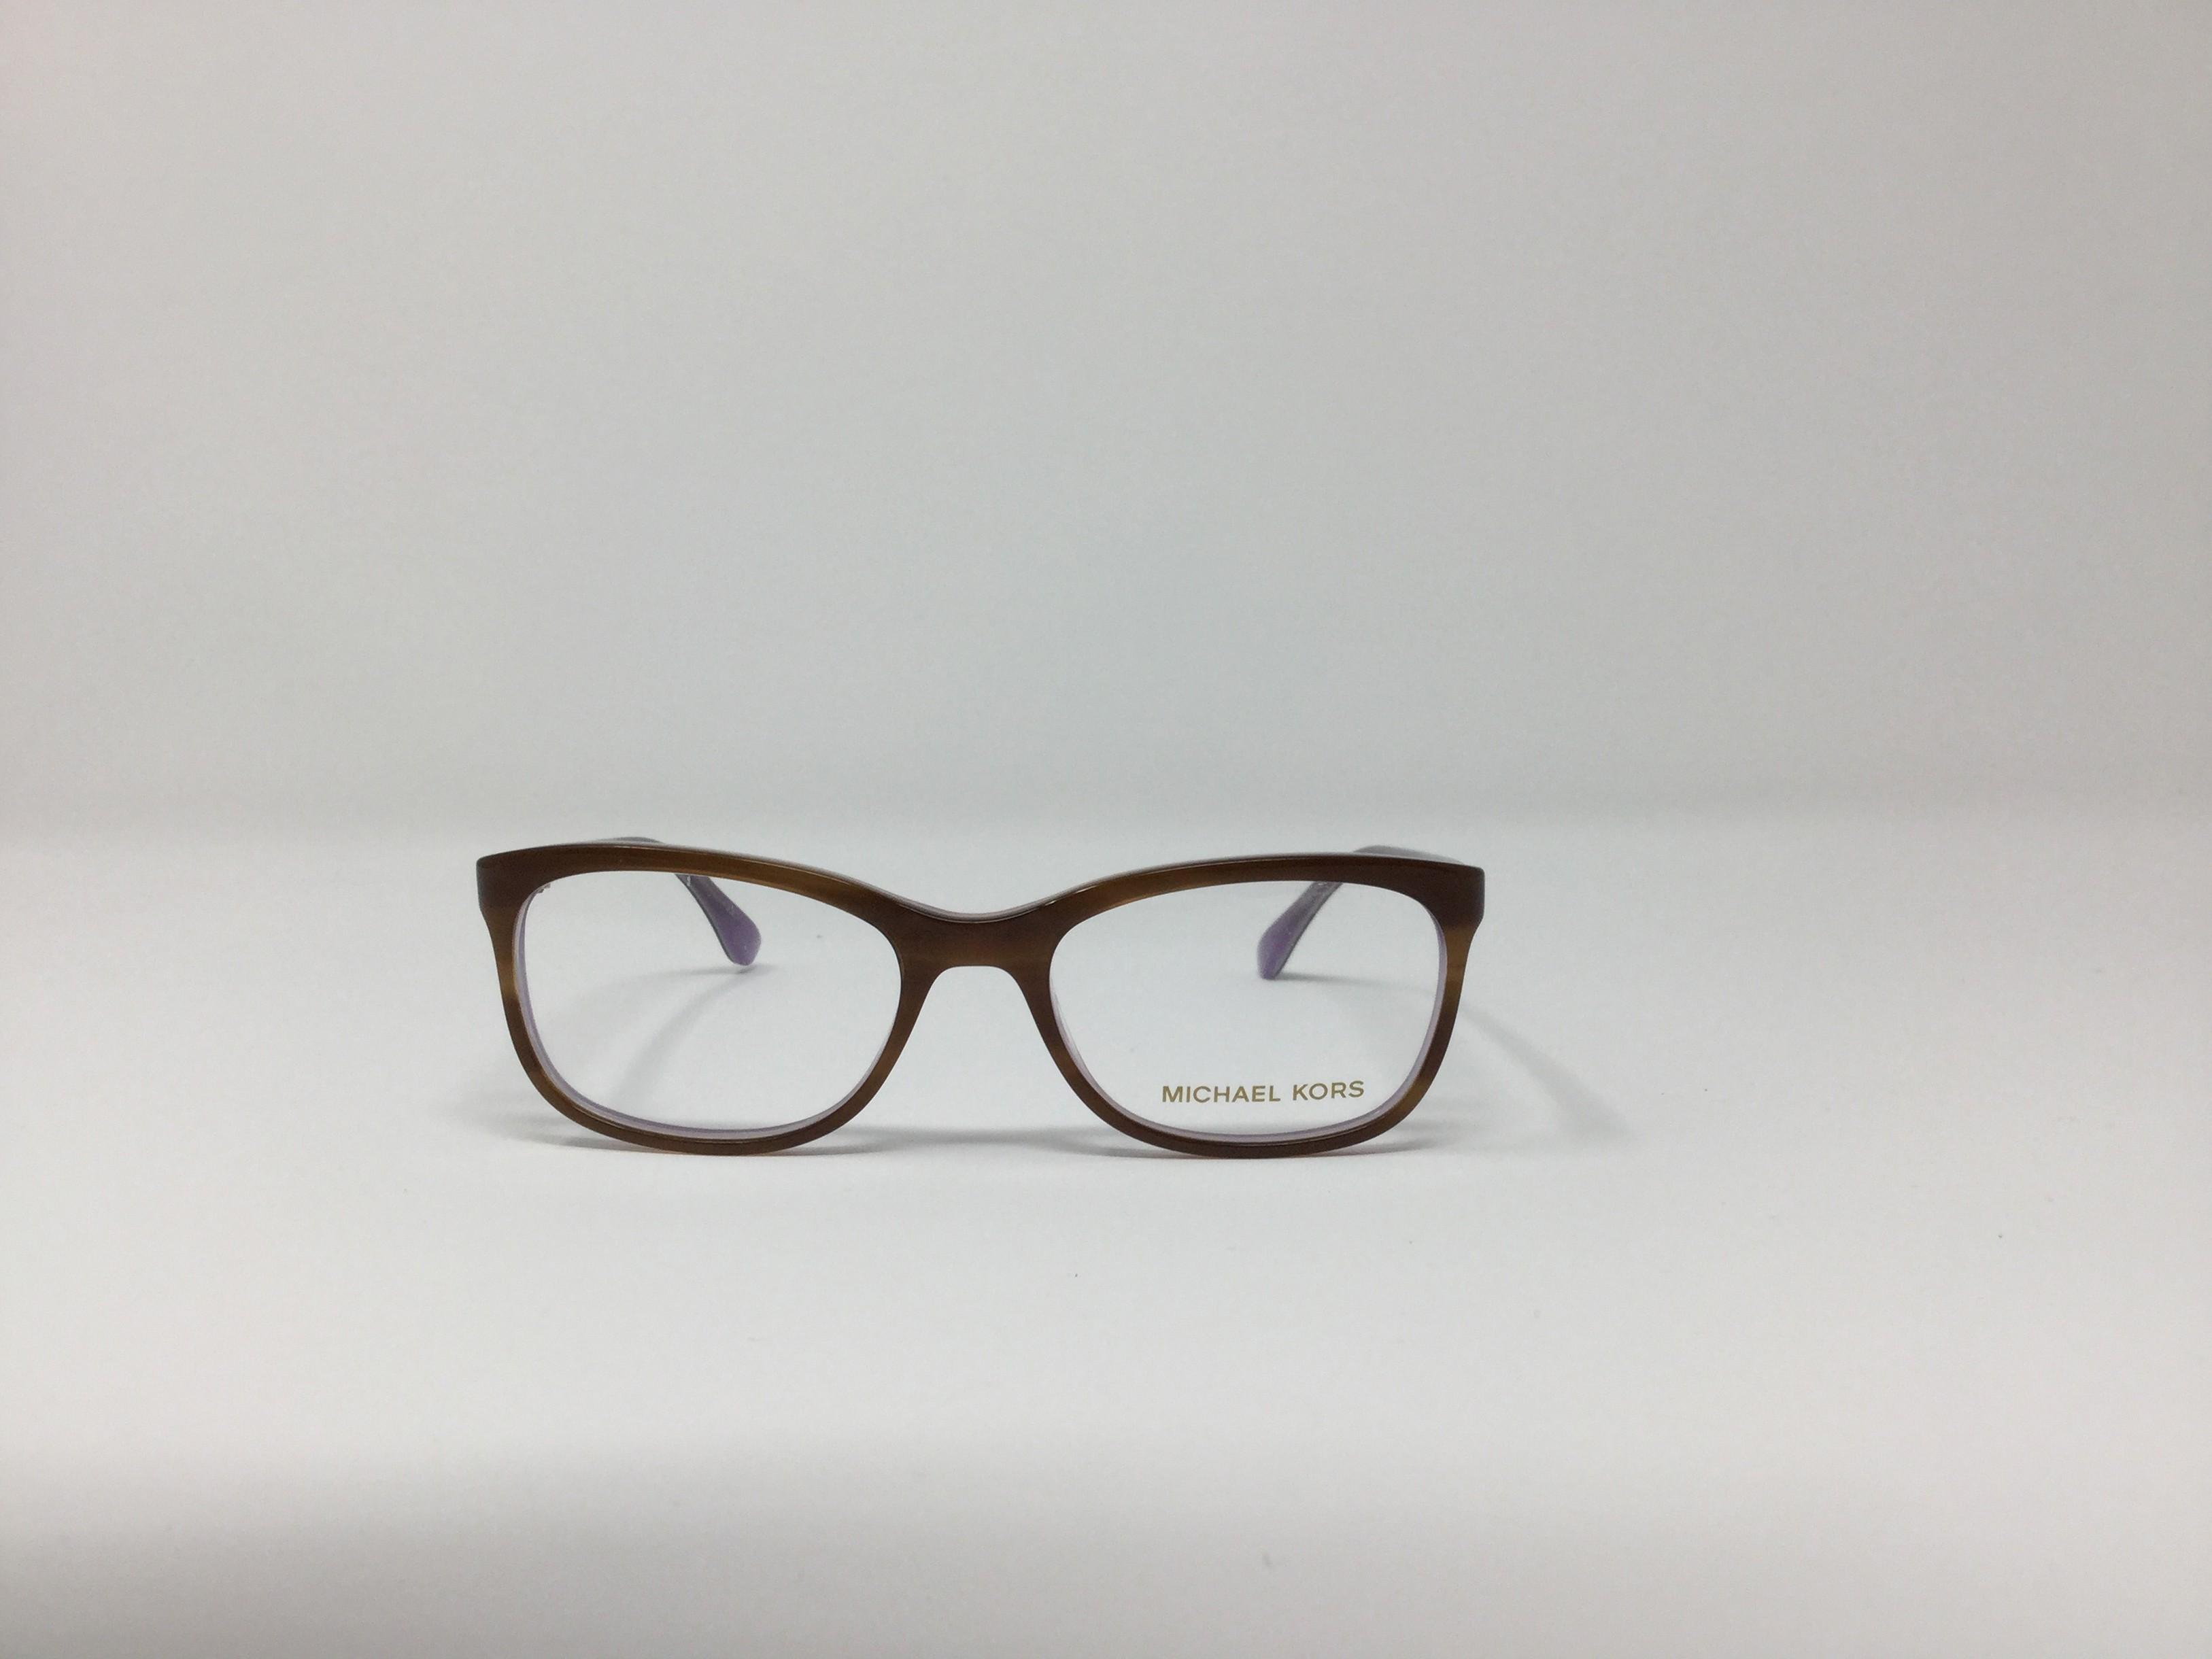 a9ab05ece9 Michael Kors MK247 Womens Eyeglasses - Women - Eyeglasses